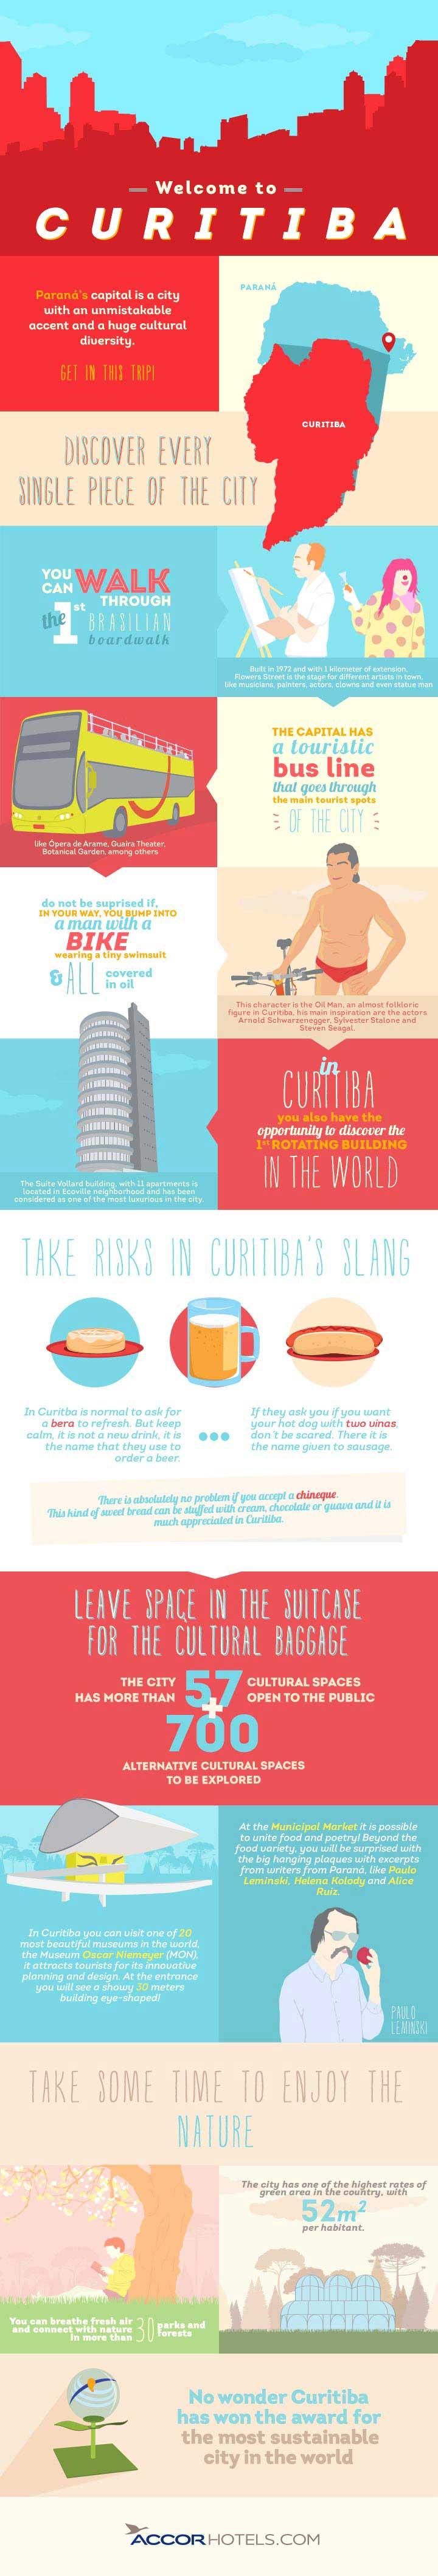 L'Infographie de Curitiba par Accorhotels.com